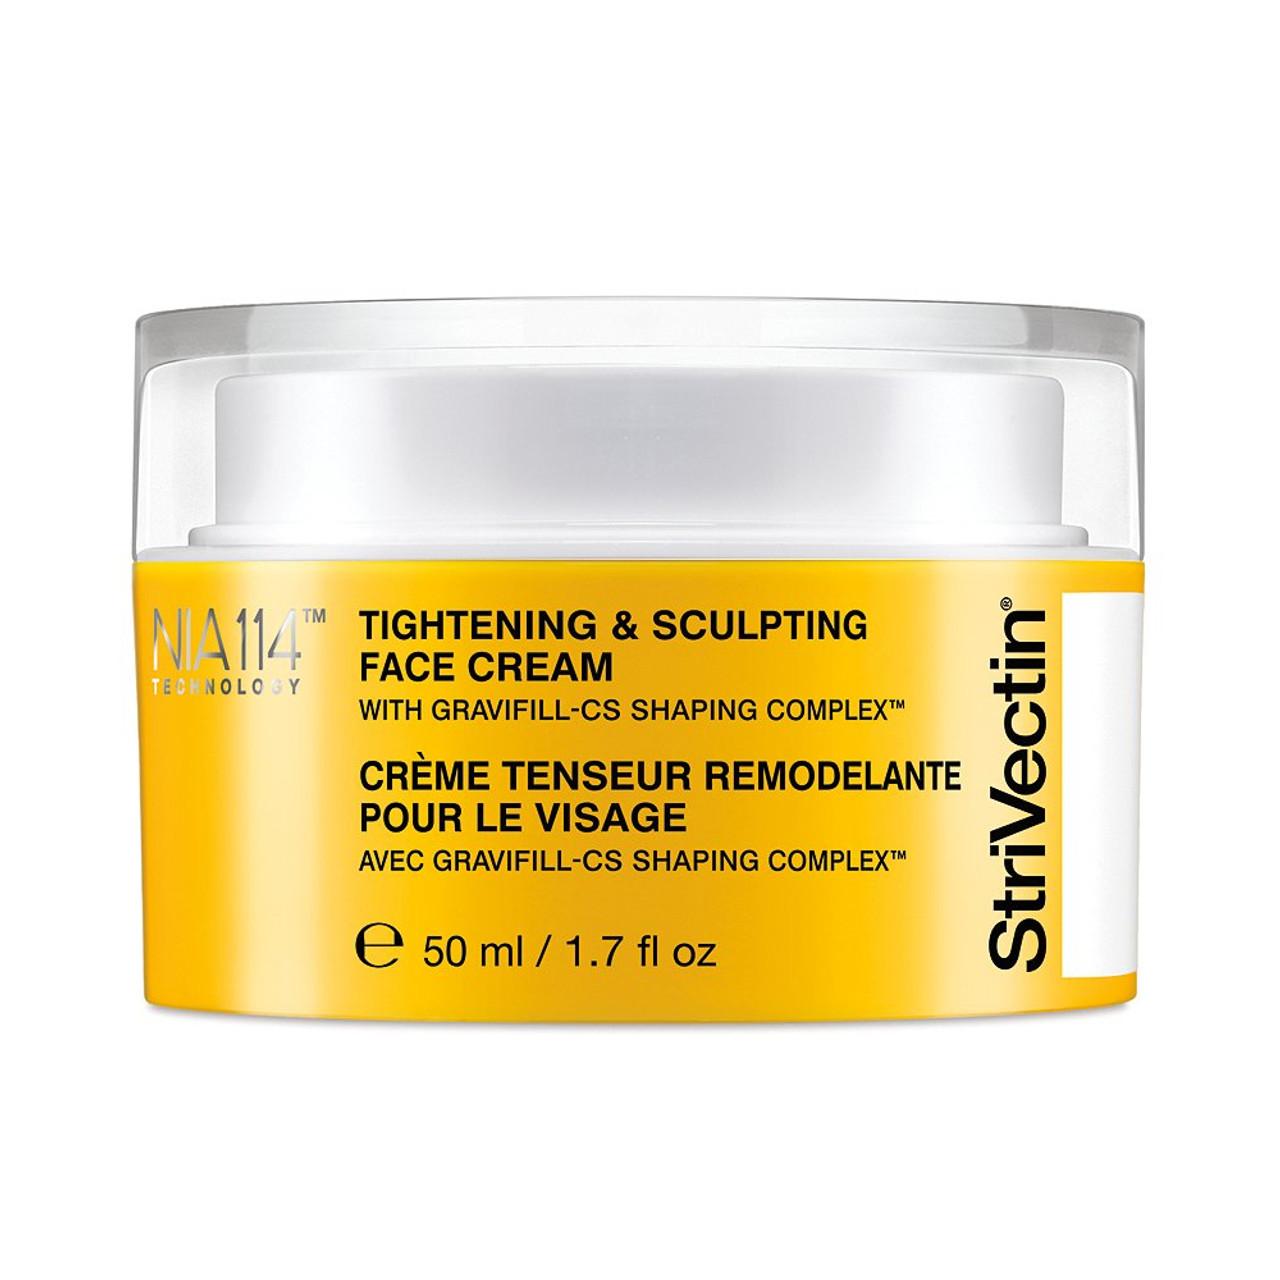 StriVectin Tightening & Sculpting Face Cream BeautifiedYou.com